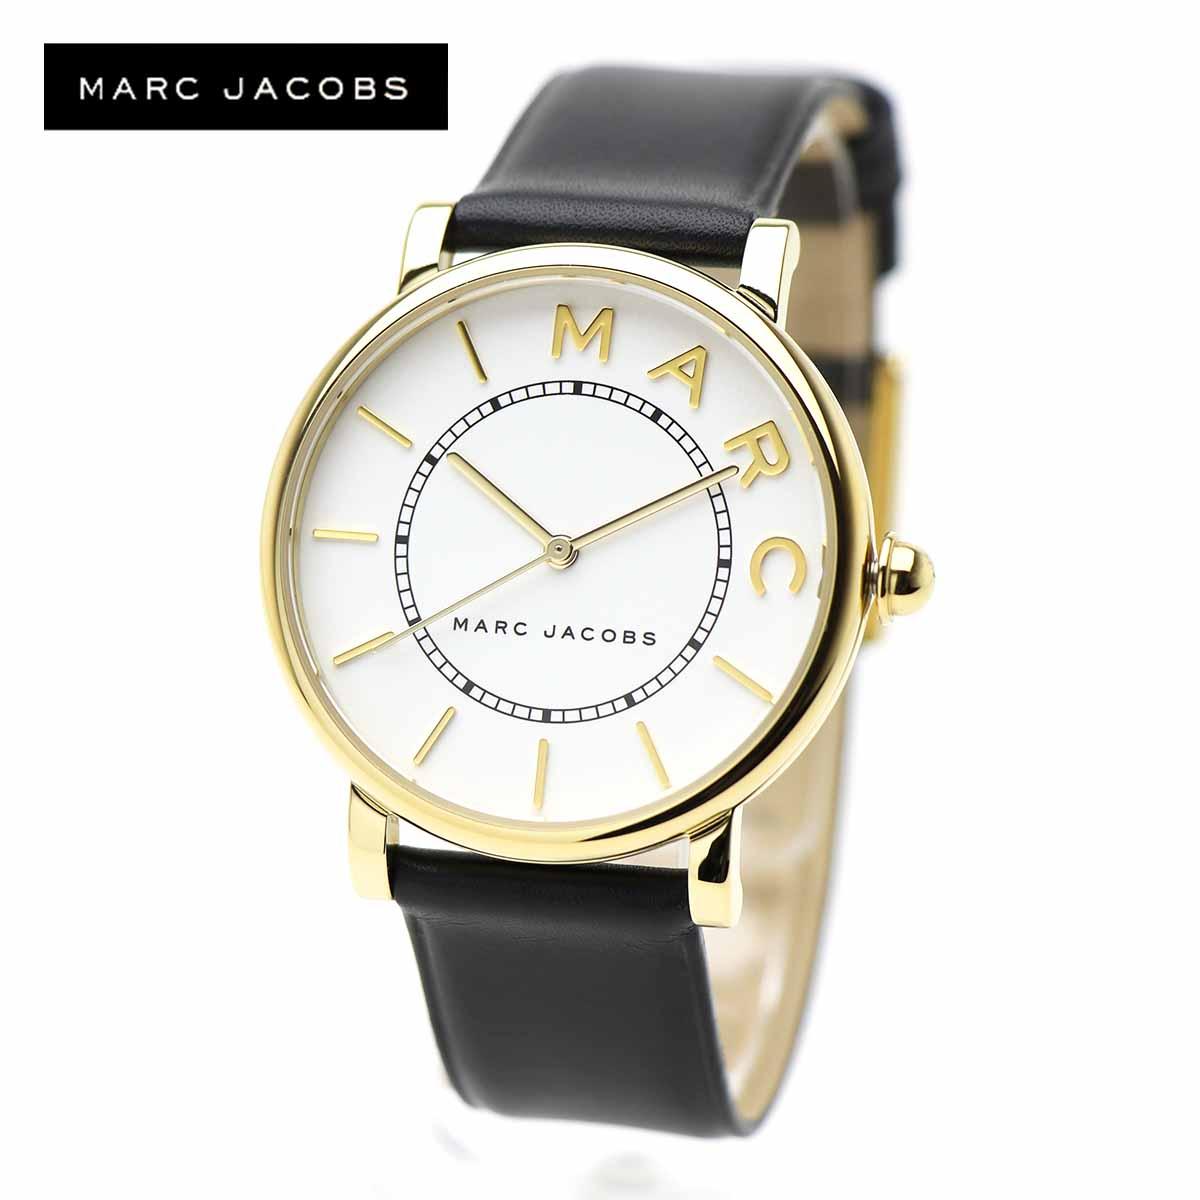 marc by marc jacobs マークバイマークジェイコブス 腕時計 LOUIS VUITTON ルイヴィトン メンズ レディース